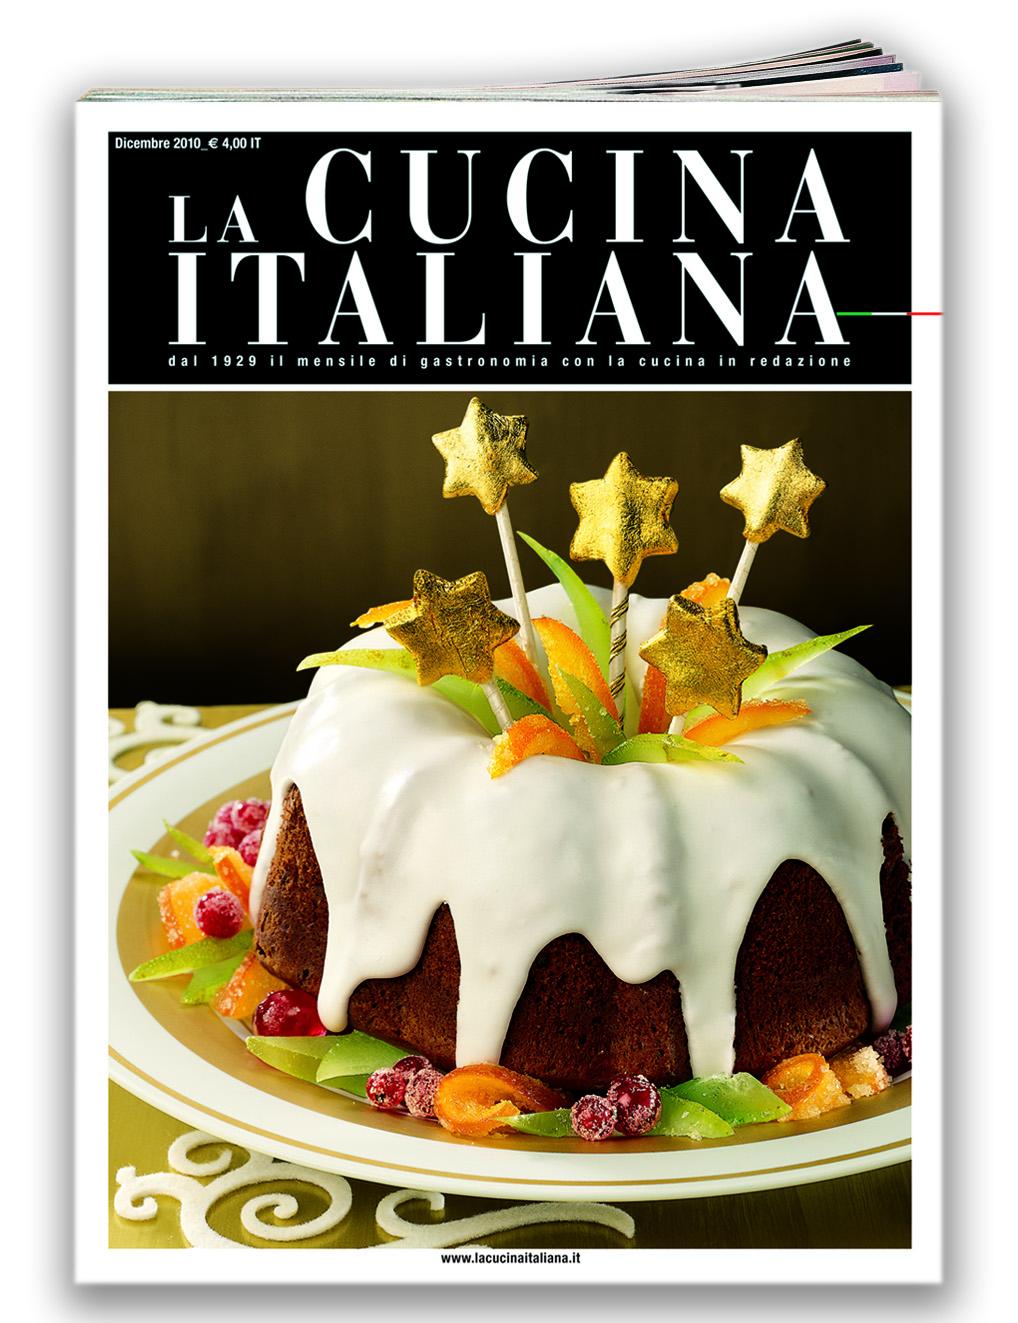 La cucina italiana sempre piu 39 vogue eatpiemonte for Cucina italiana